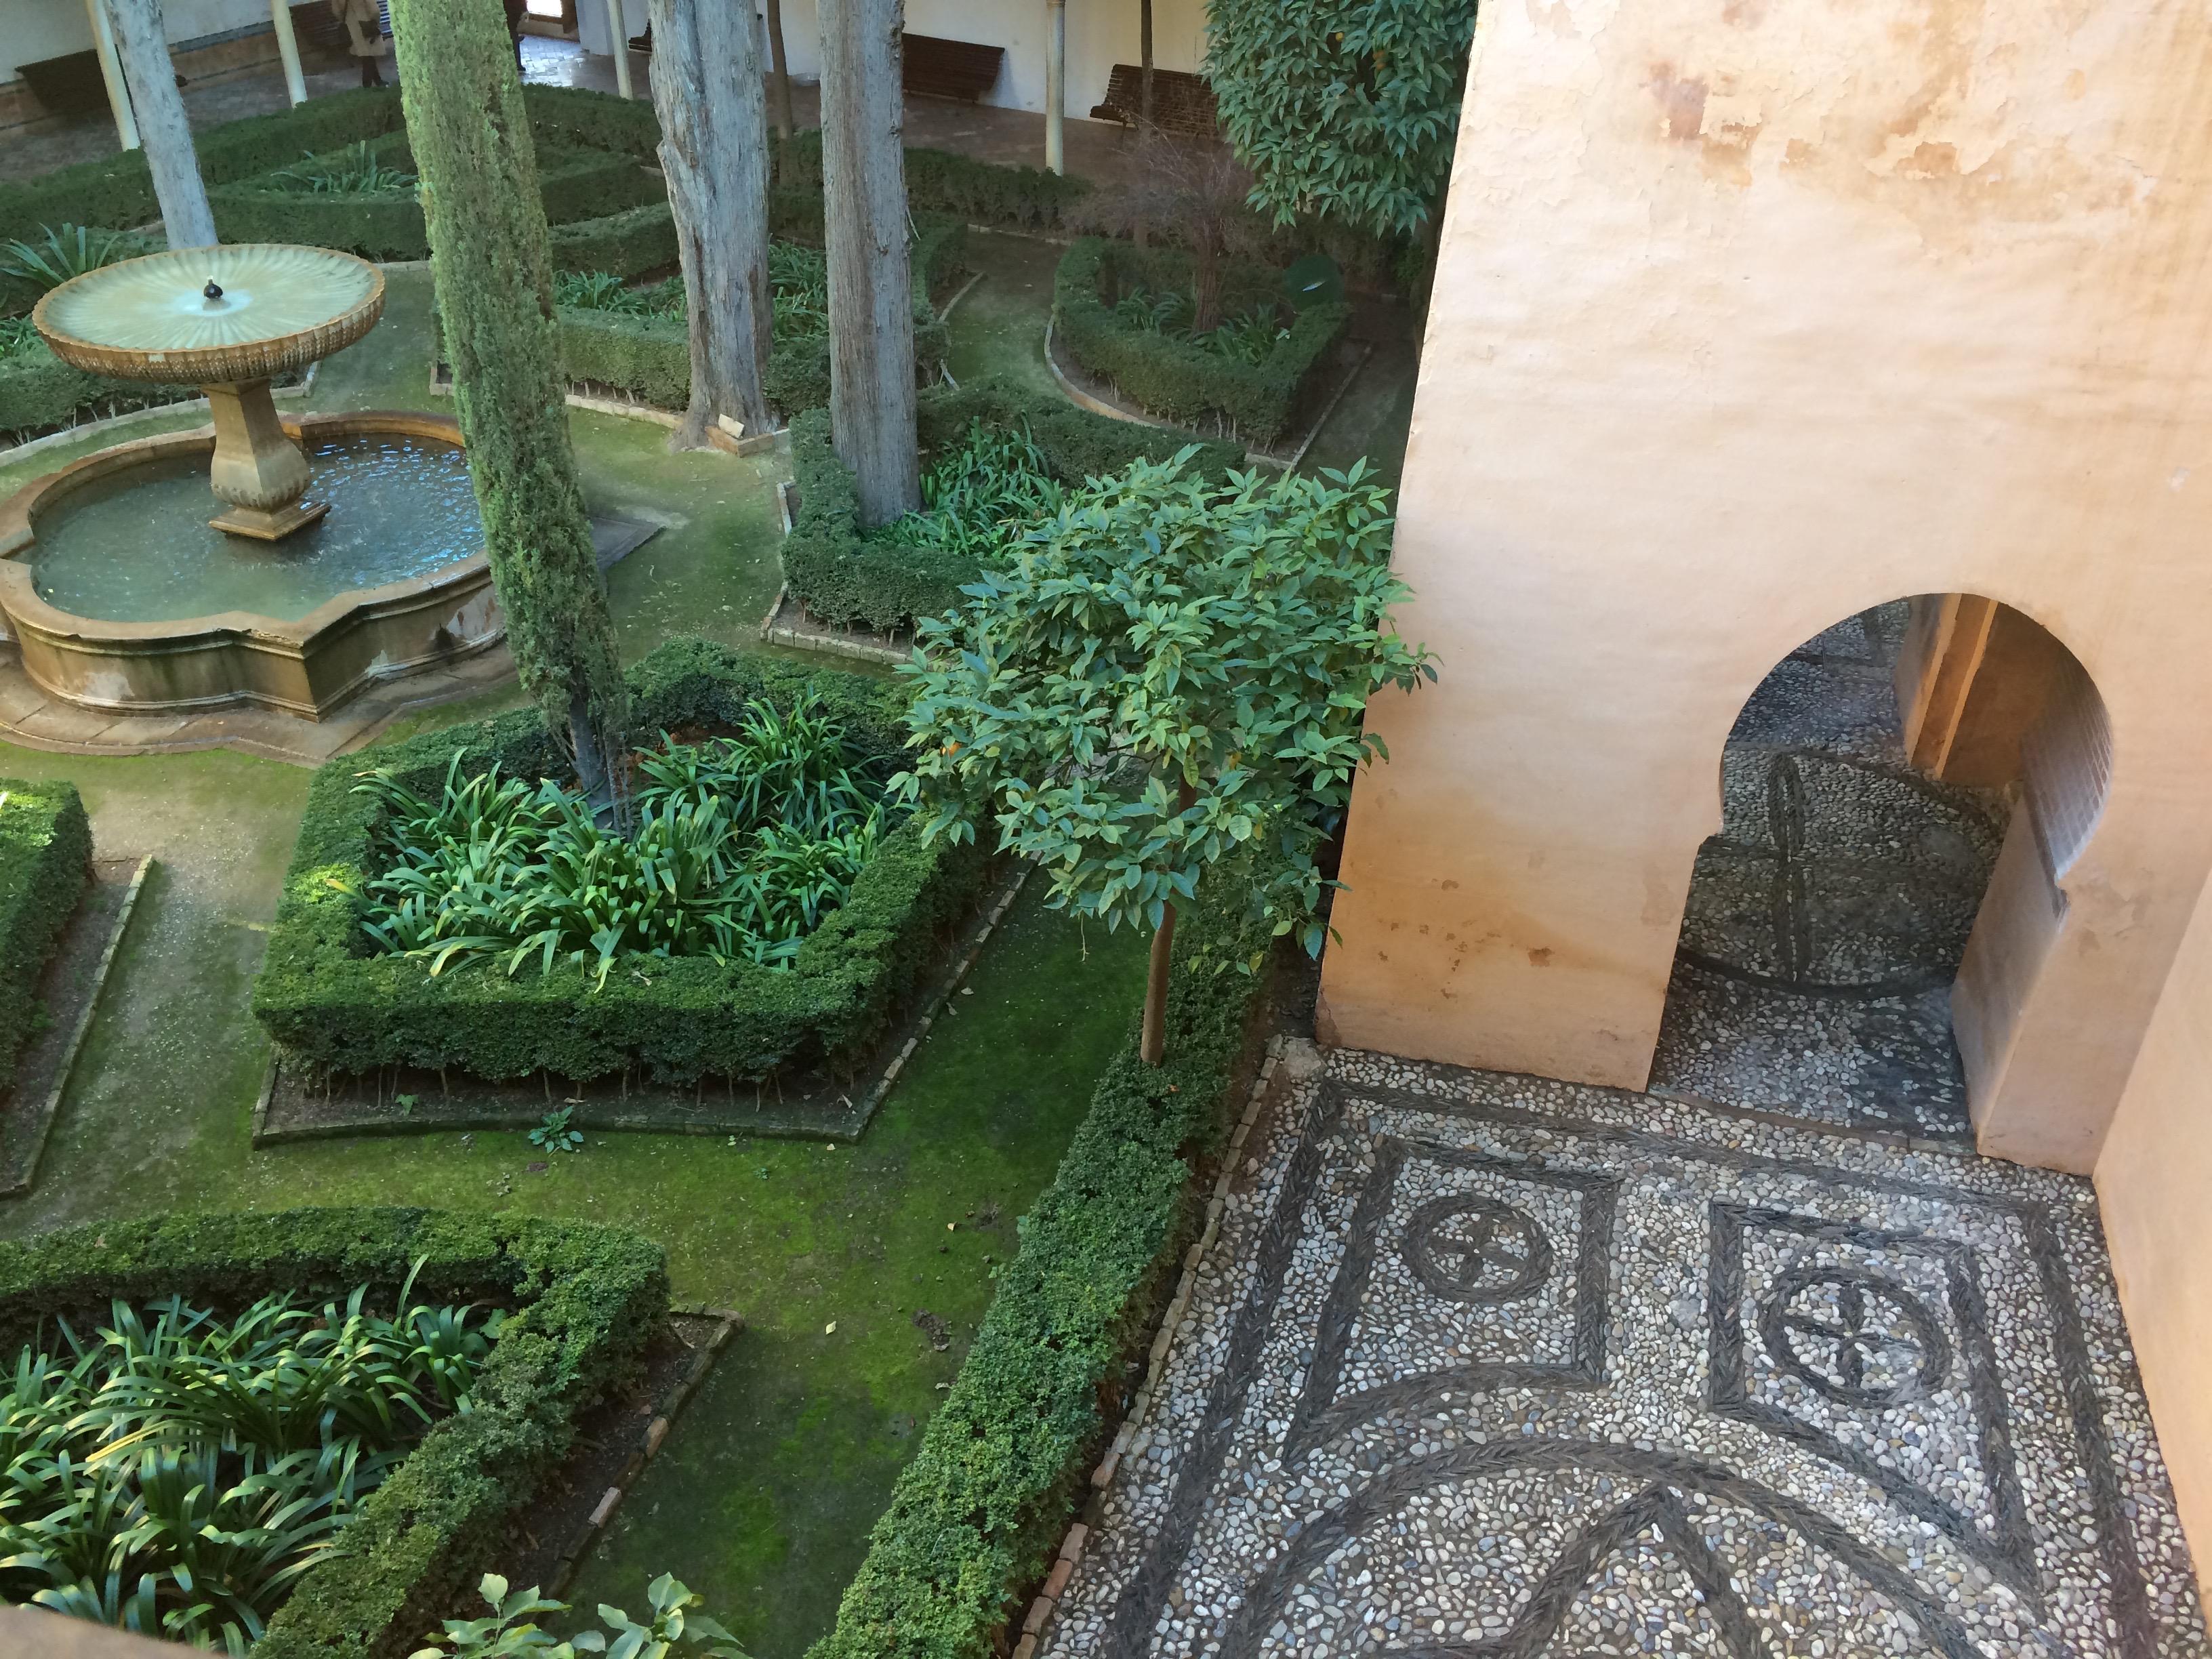 Alhambra Granada Spain - Nasrid Palaces garden